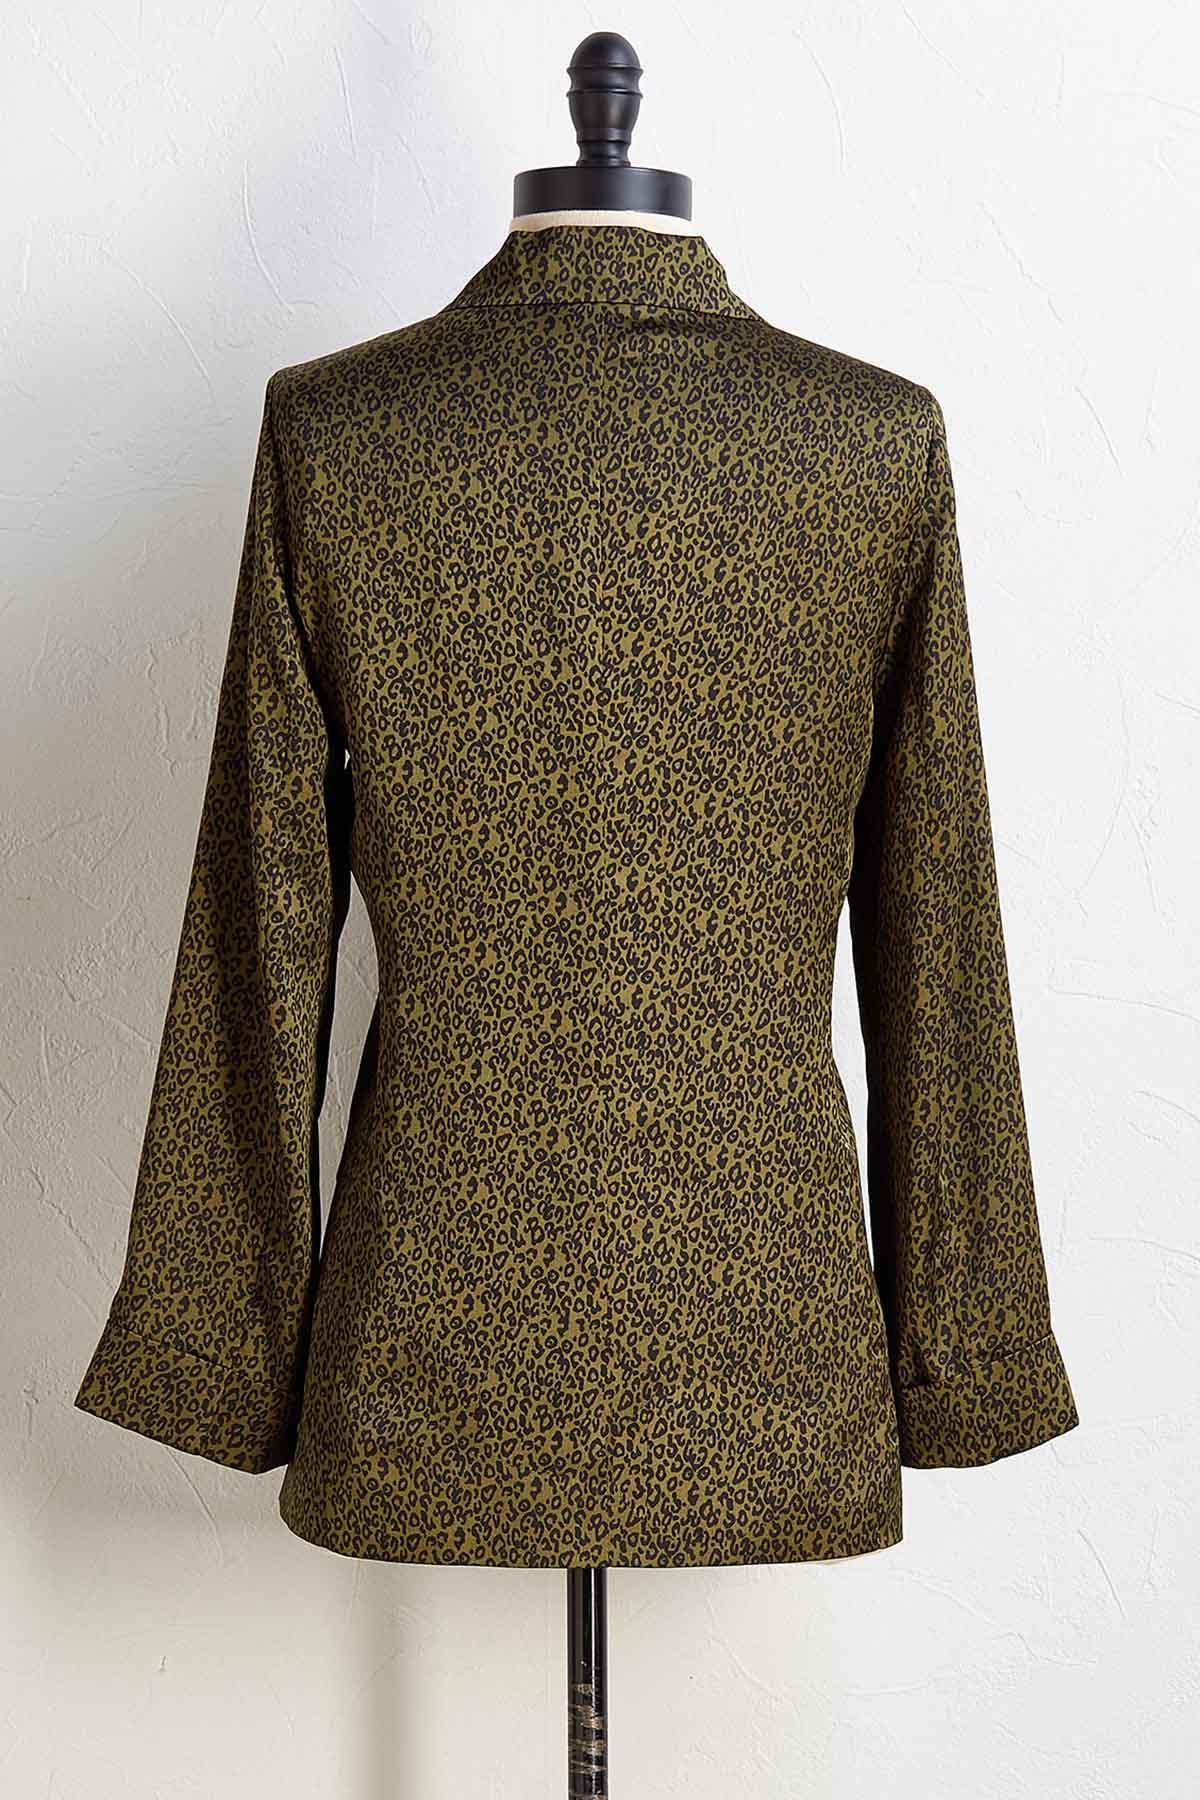 Satin Leopard Blazer